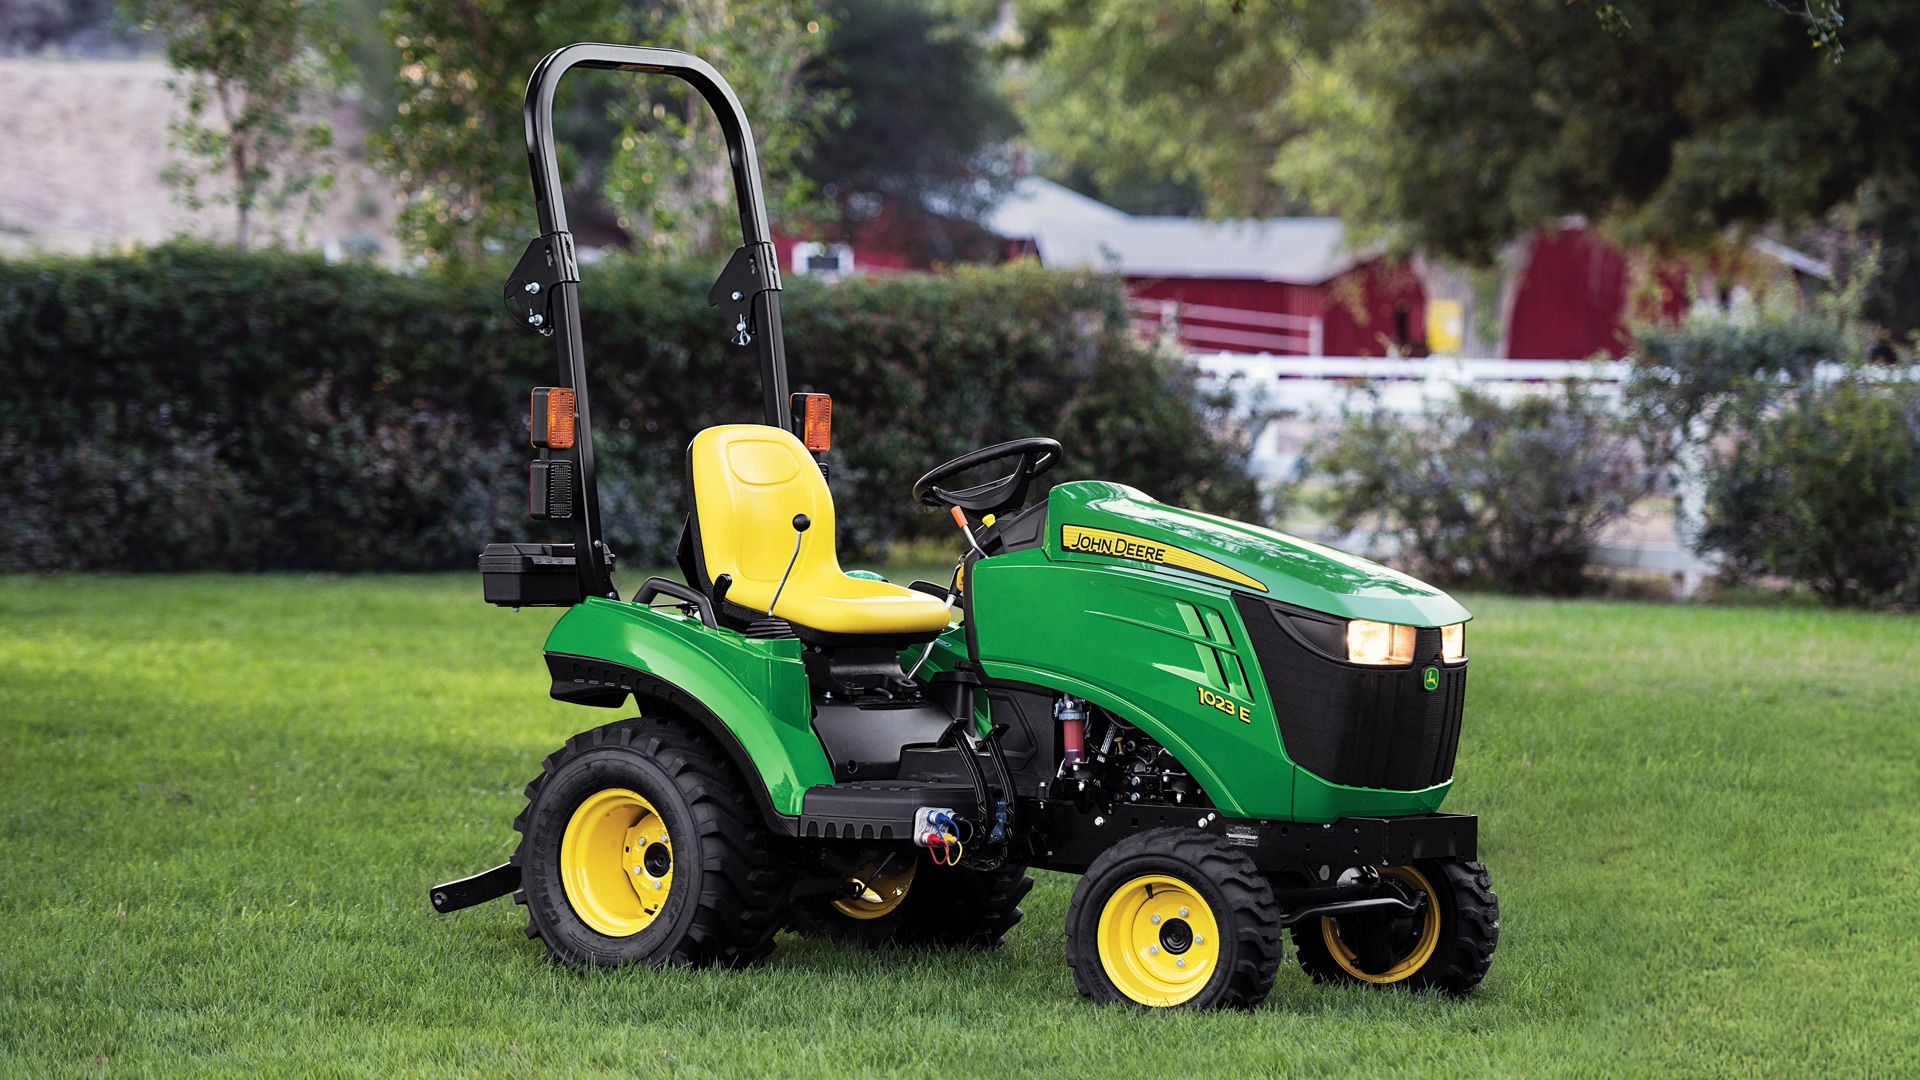 1family-utility-tractor-hero-r4e038695